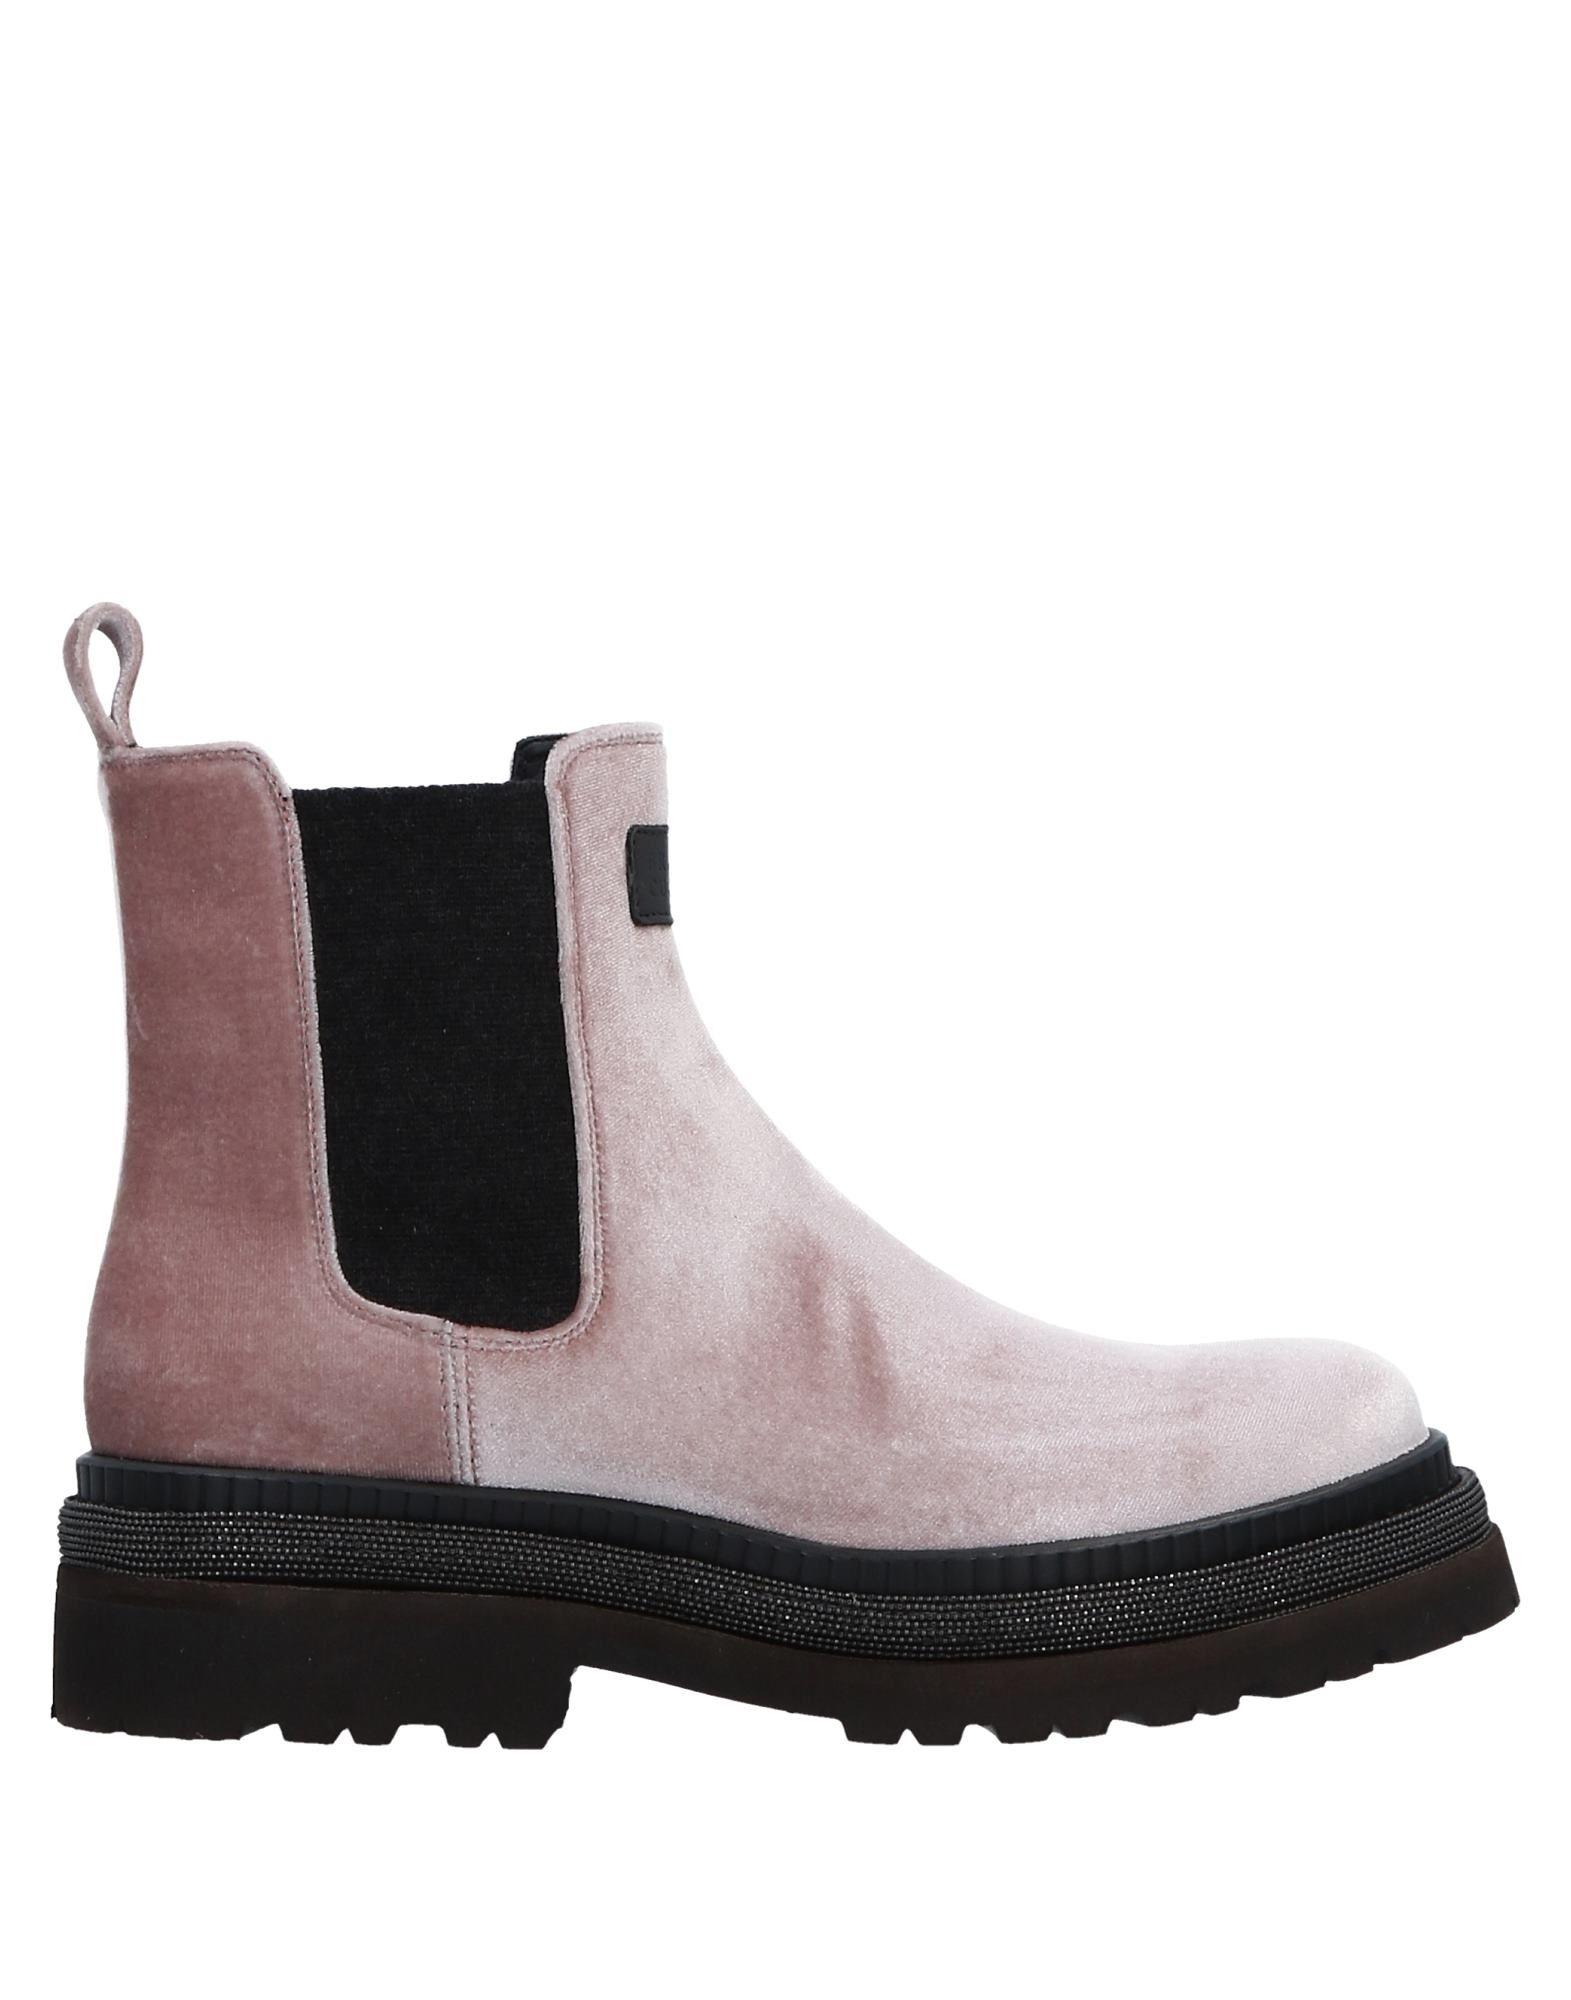 Chelsea Boots Brunello Cucinelli Donna - 11516255AB